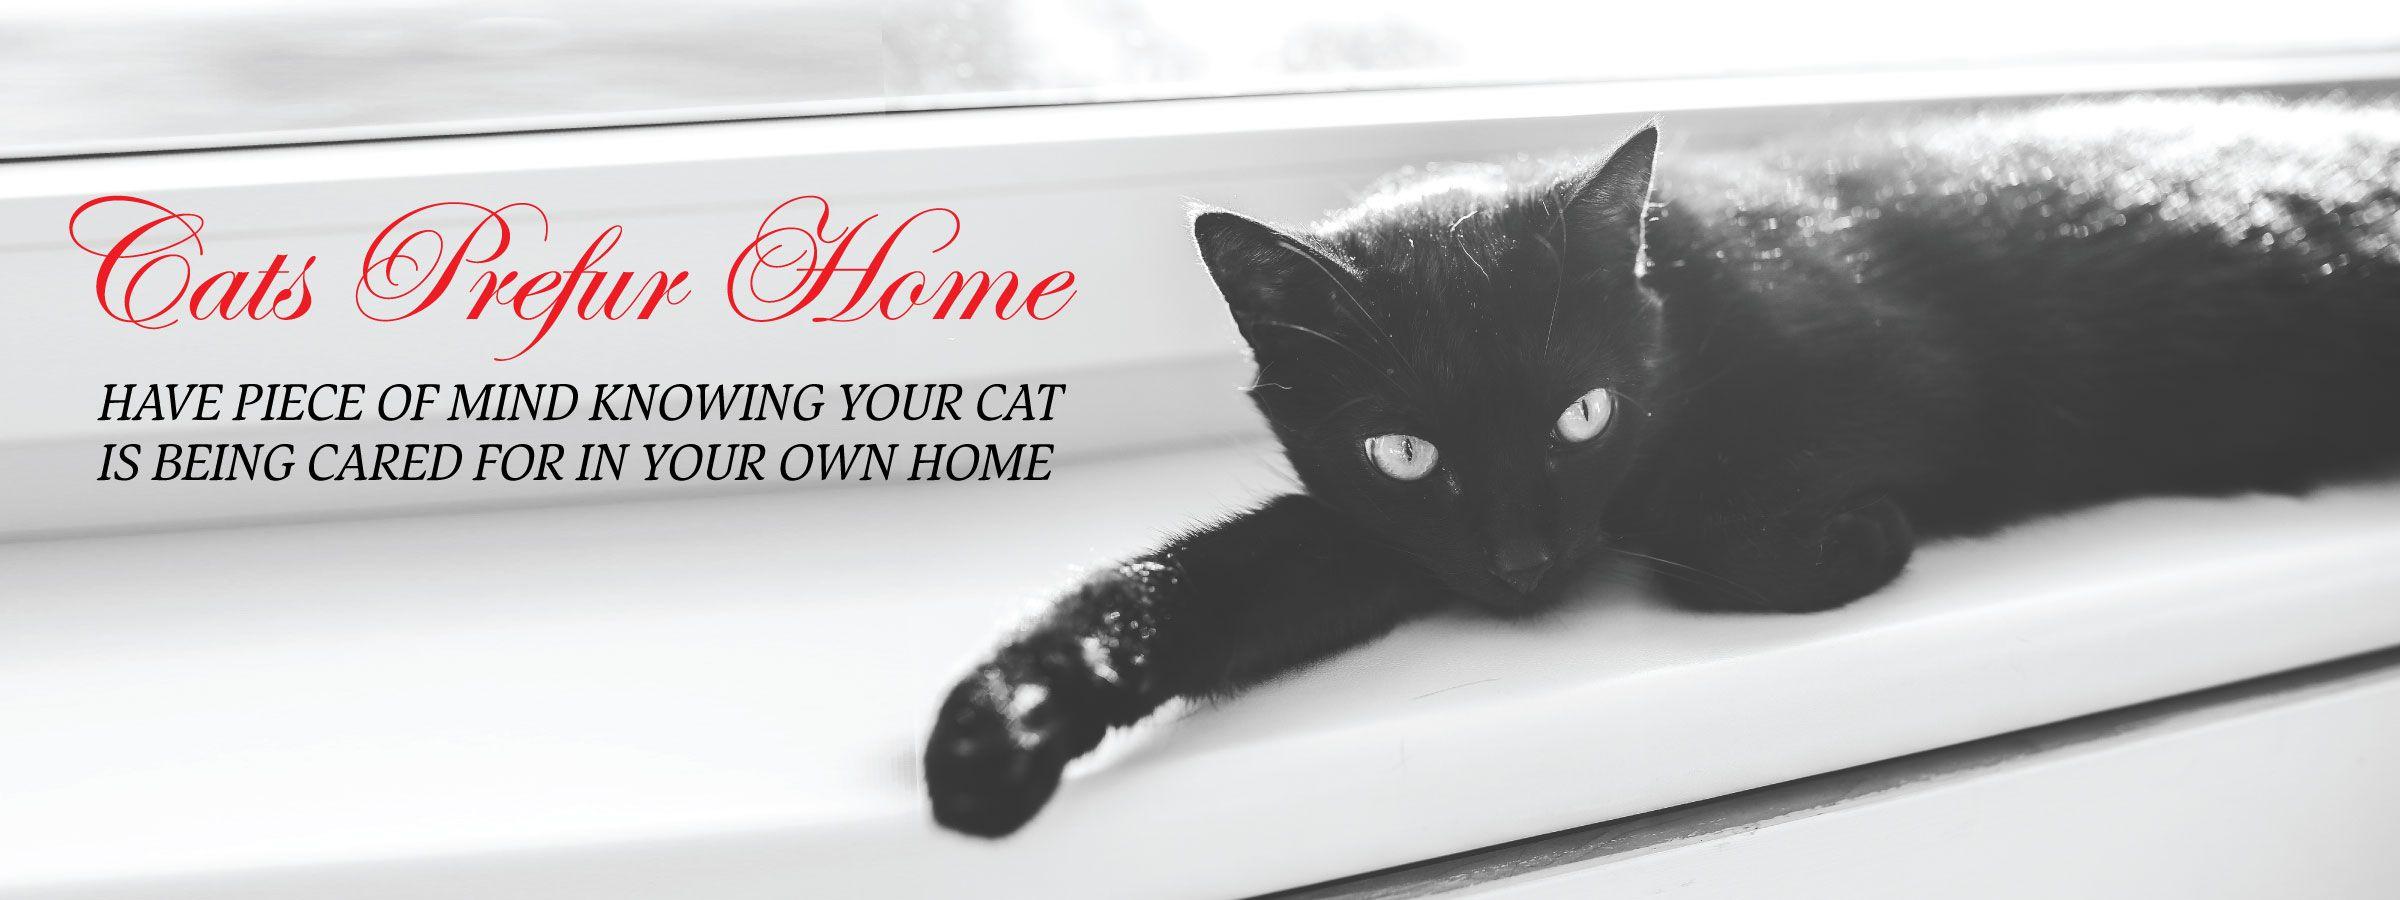 cats-prefur-home